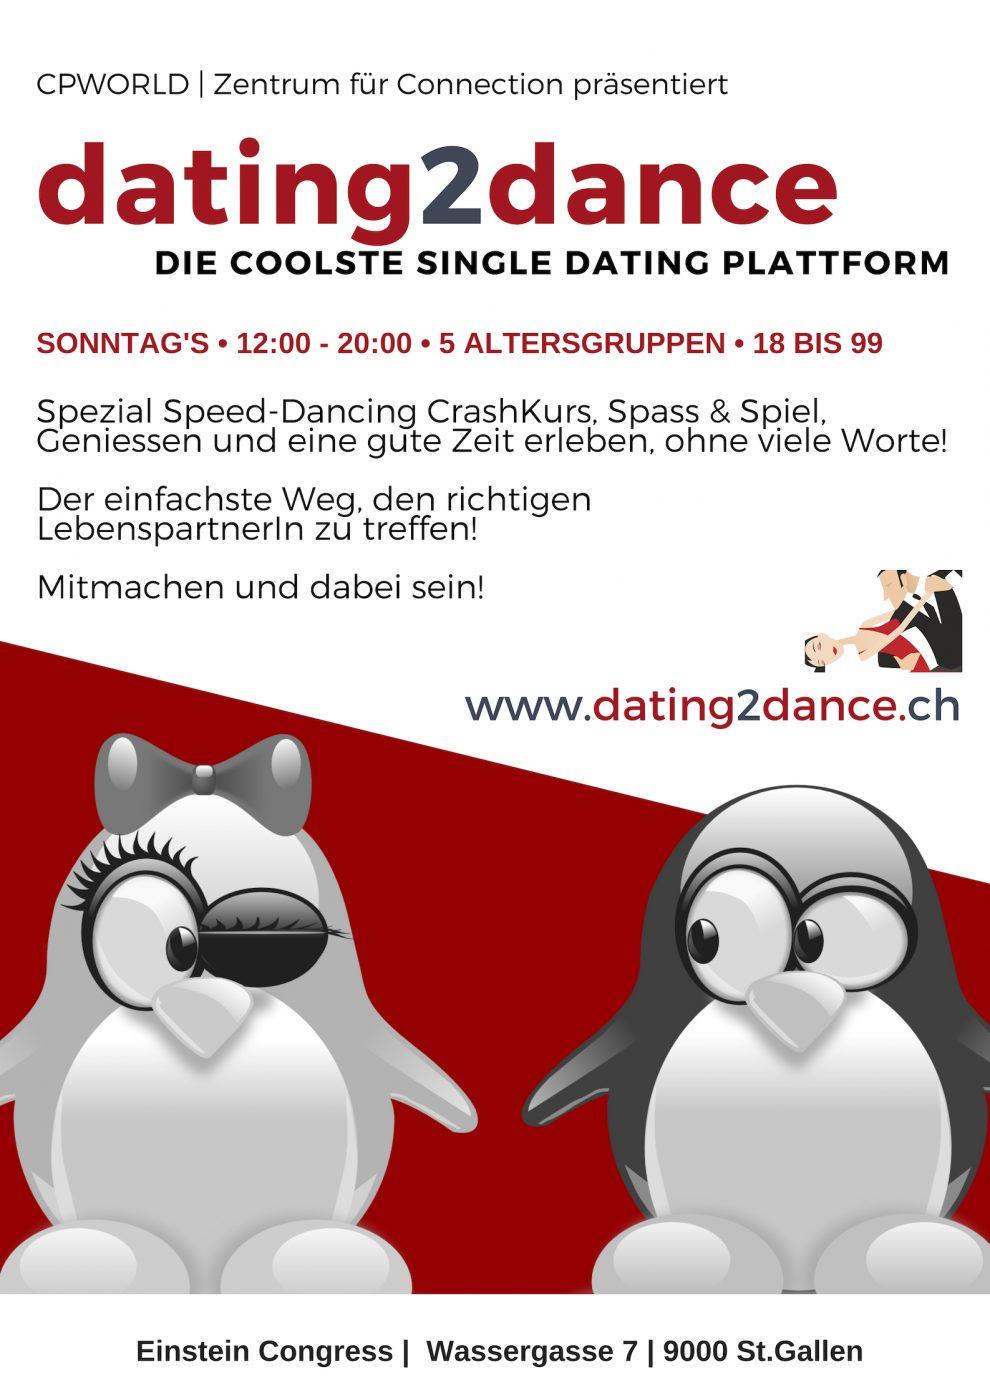 dating2dance ¦ datingtwodance